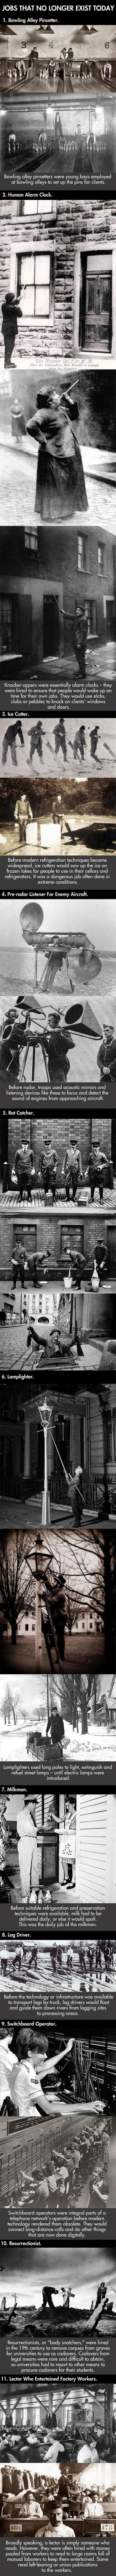 historische-fotos29-20